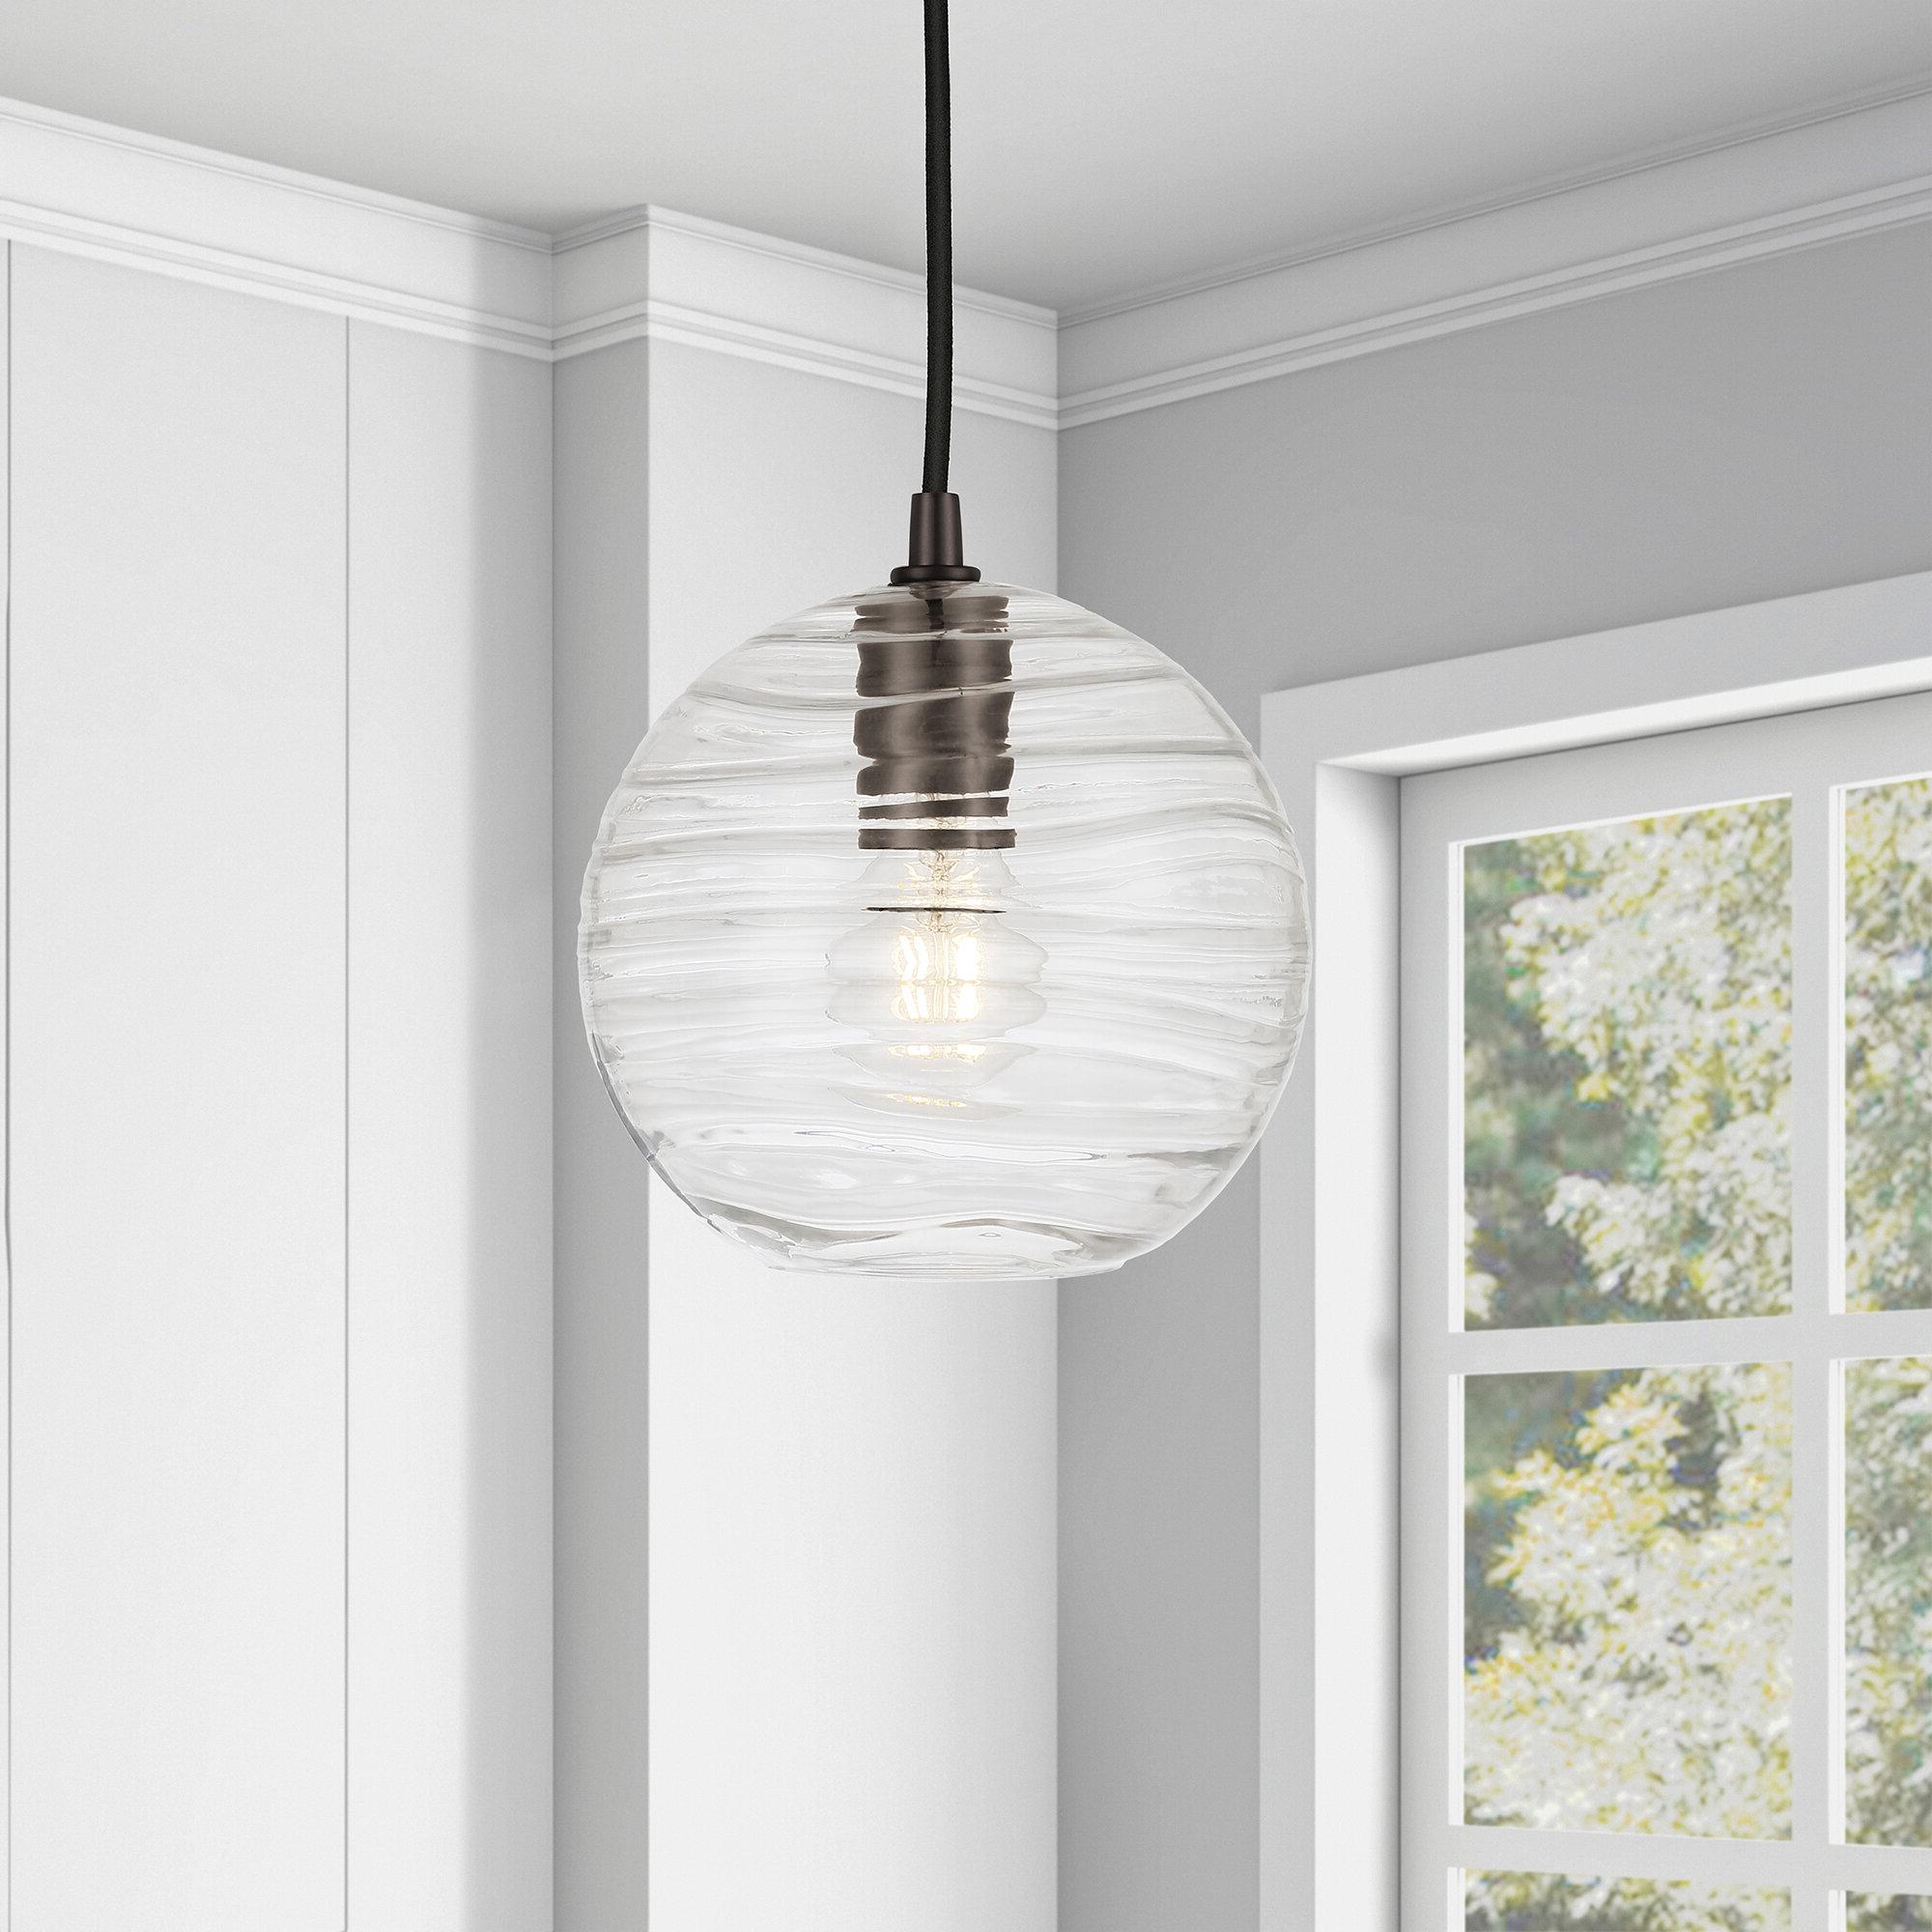 Well Liked Prange 1 Light Single Globe Pendants With Regard To Aaru 1 Light Single Globe Pendant (View 19 of 20)